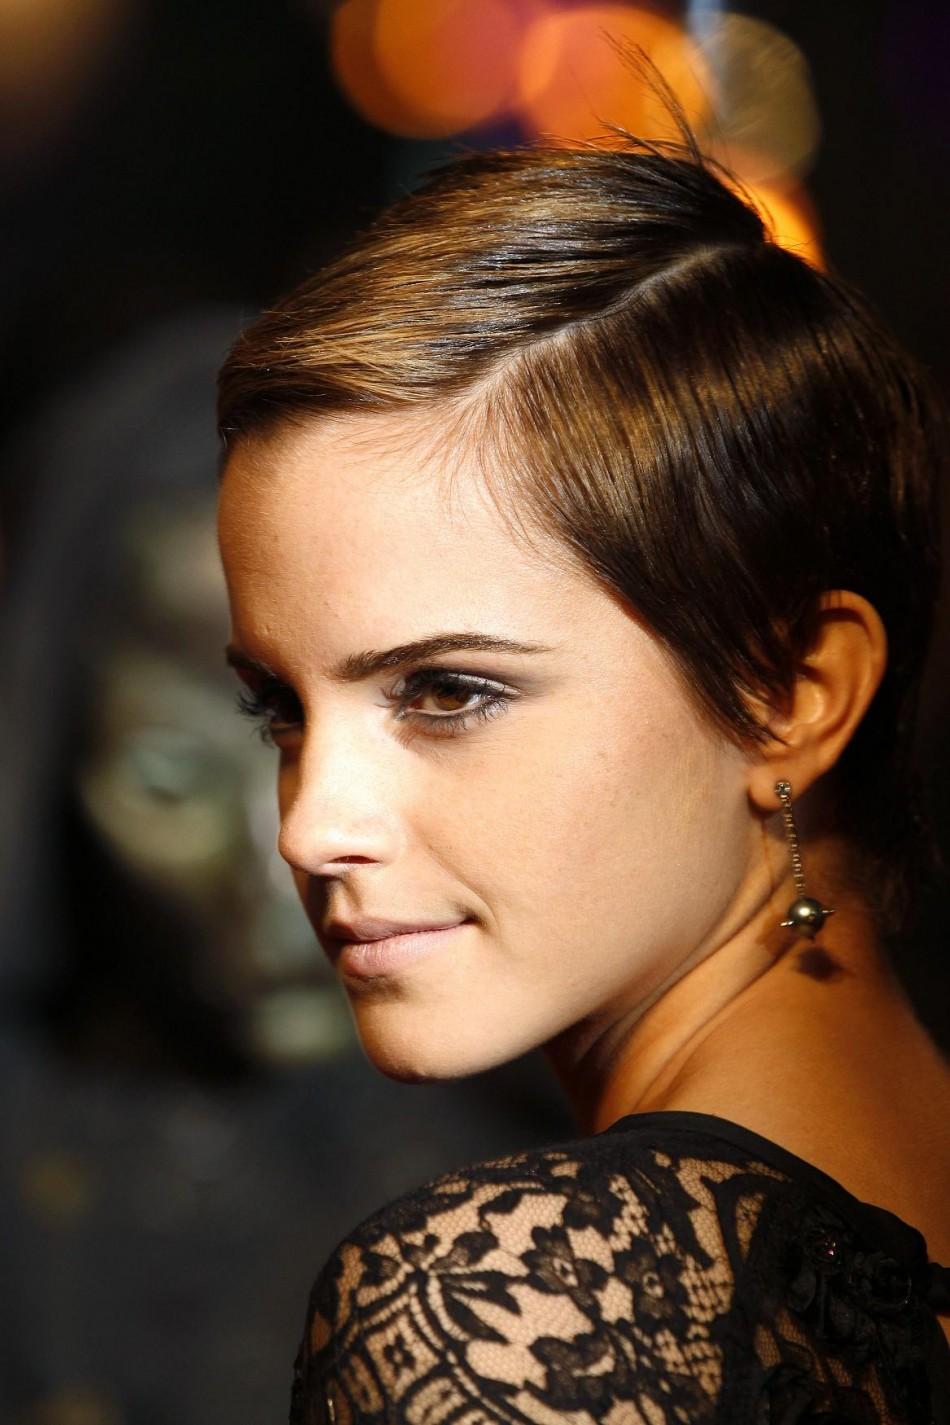 Emma Watson as Anastacia Steele in Fifty Shades of Grey Movie